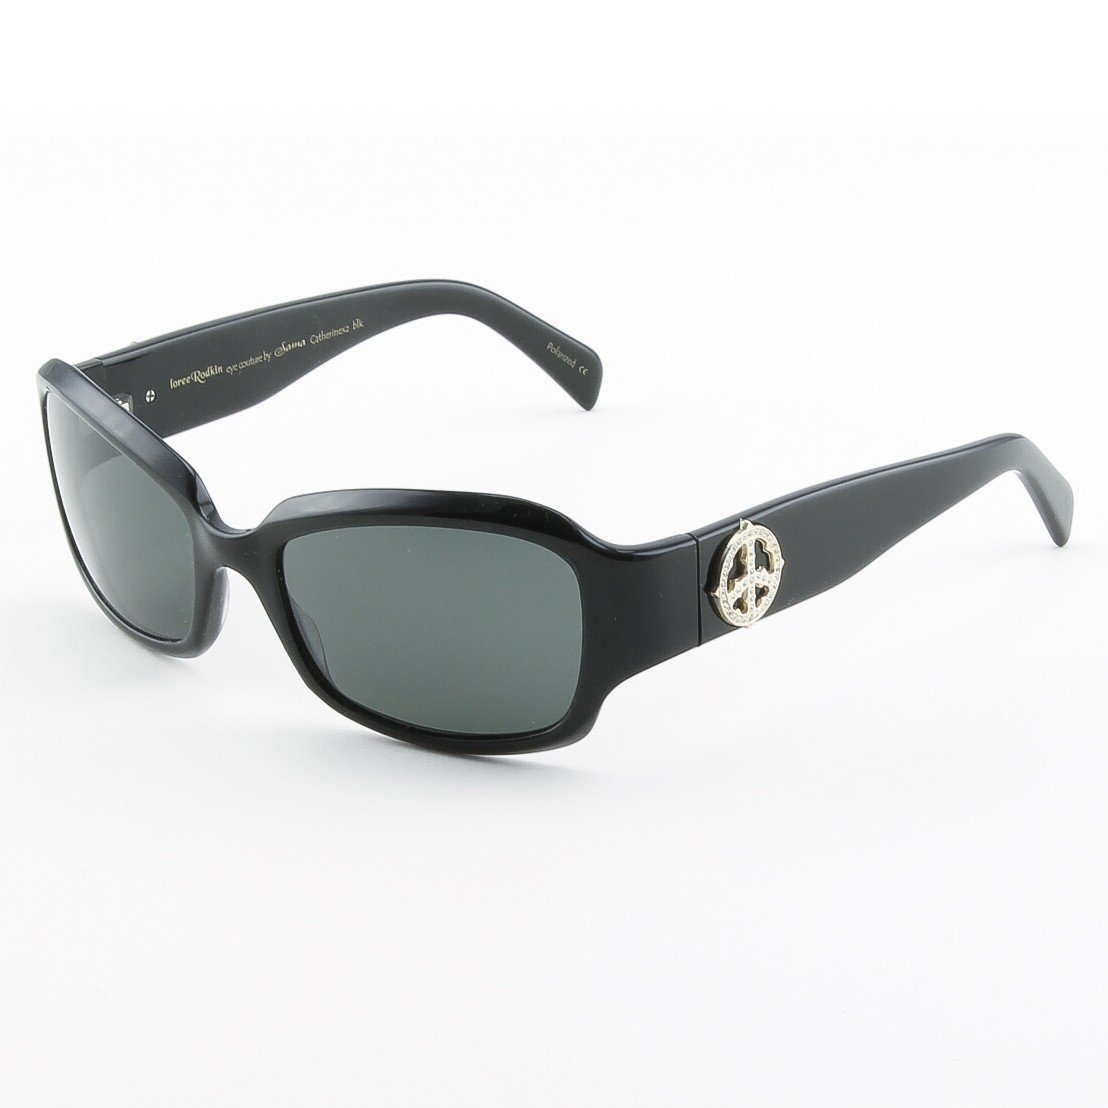 Loree Rodkin Catherine Sunglasses Black w/ Dark Gray Lenses, Sterling Silver, Swarovski Crystals